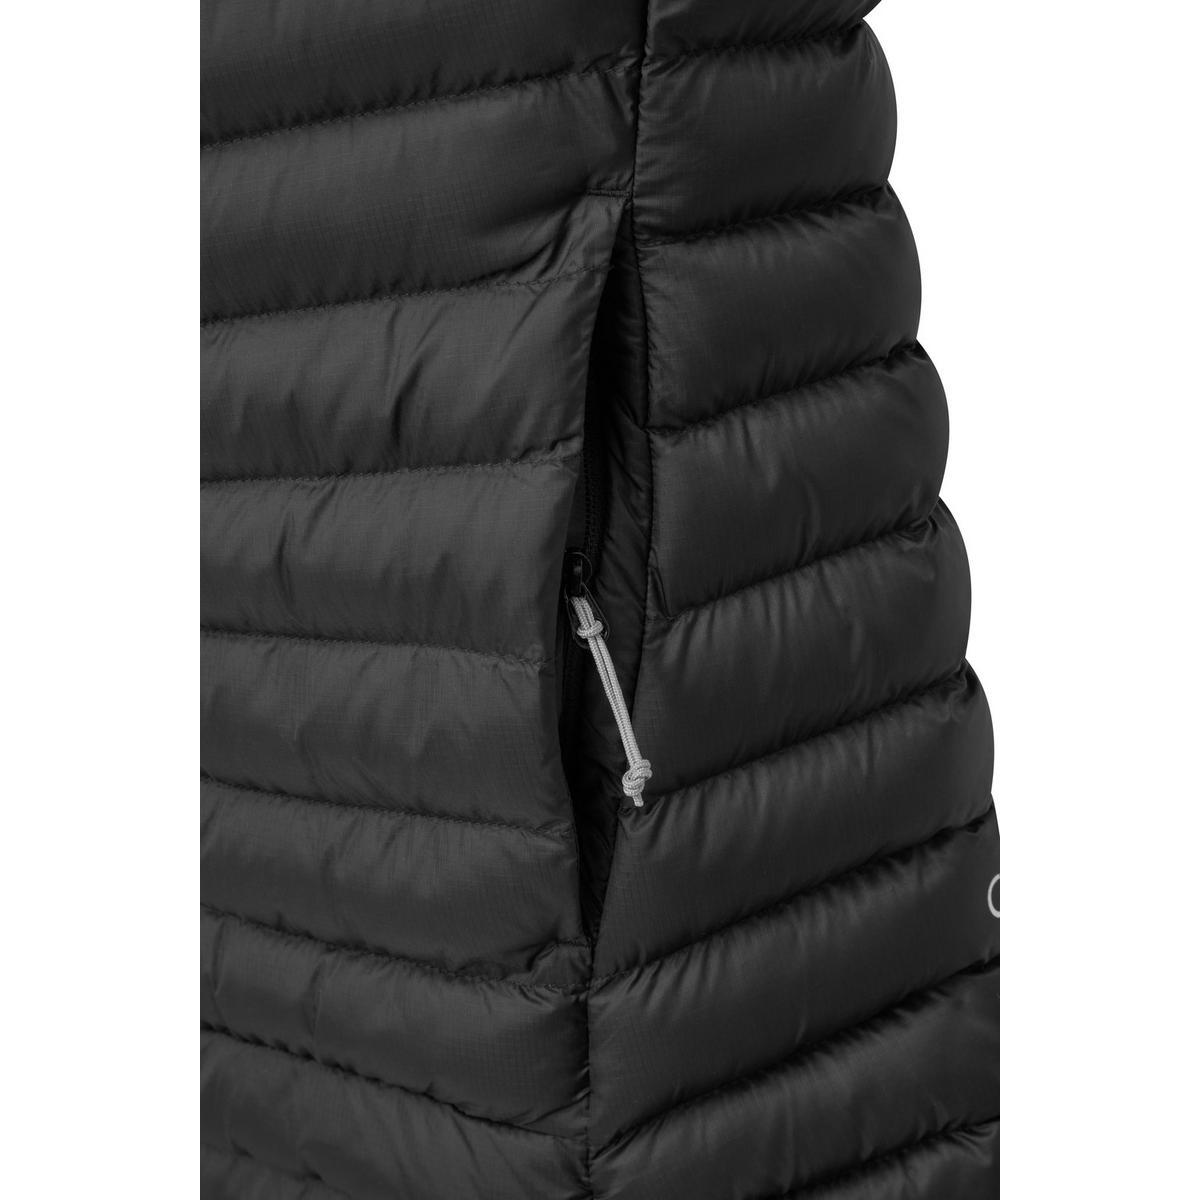 Rab Men's Rab Cirrus Vest - Black